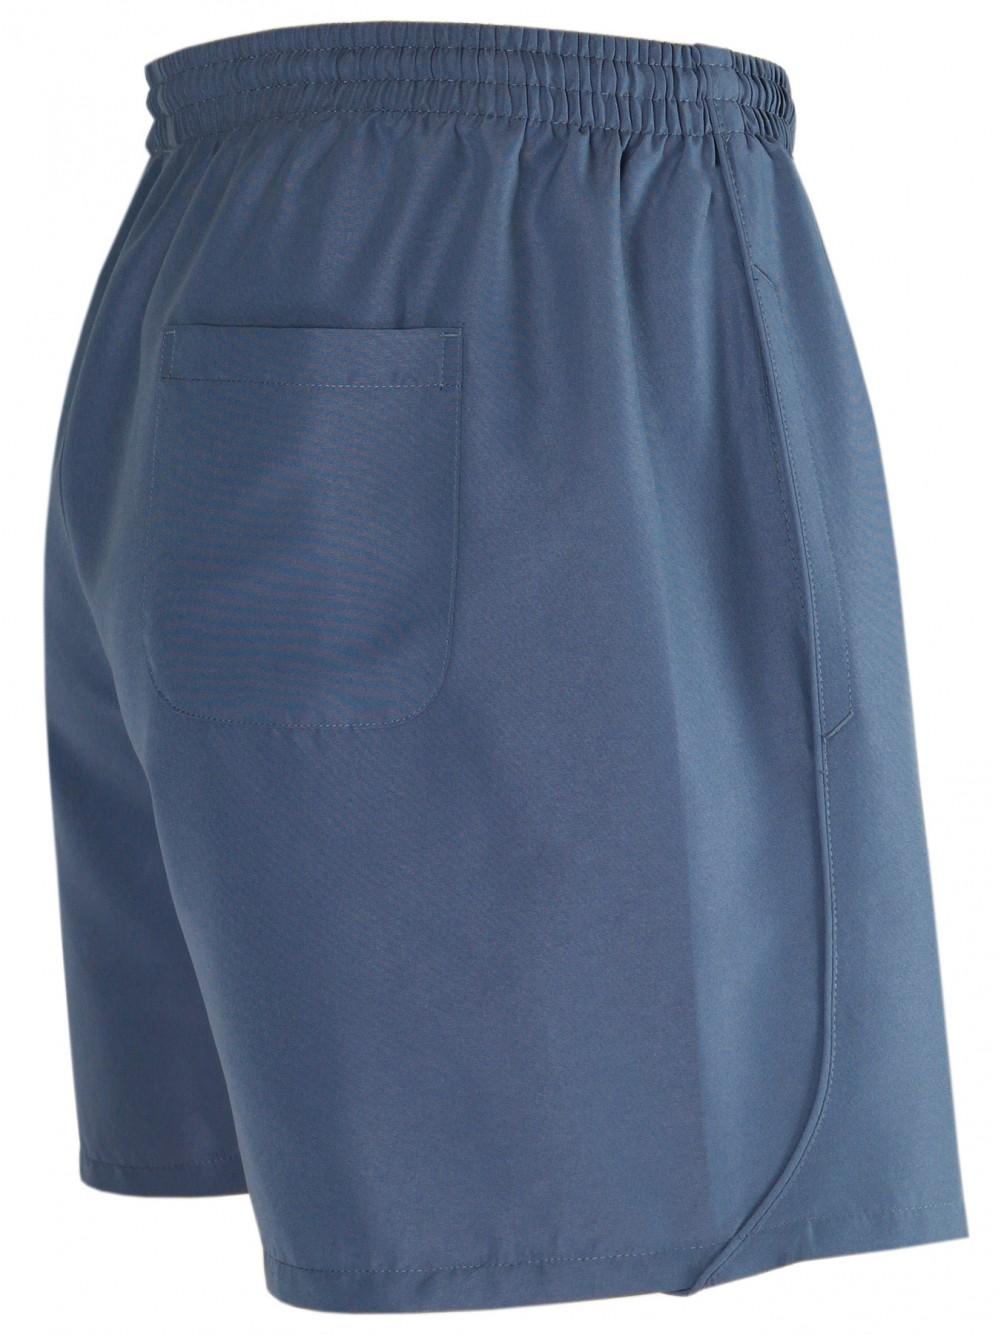 Herren Shorts kurze Hose aus ultra-leichter Mikrofaser - Grau